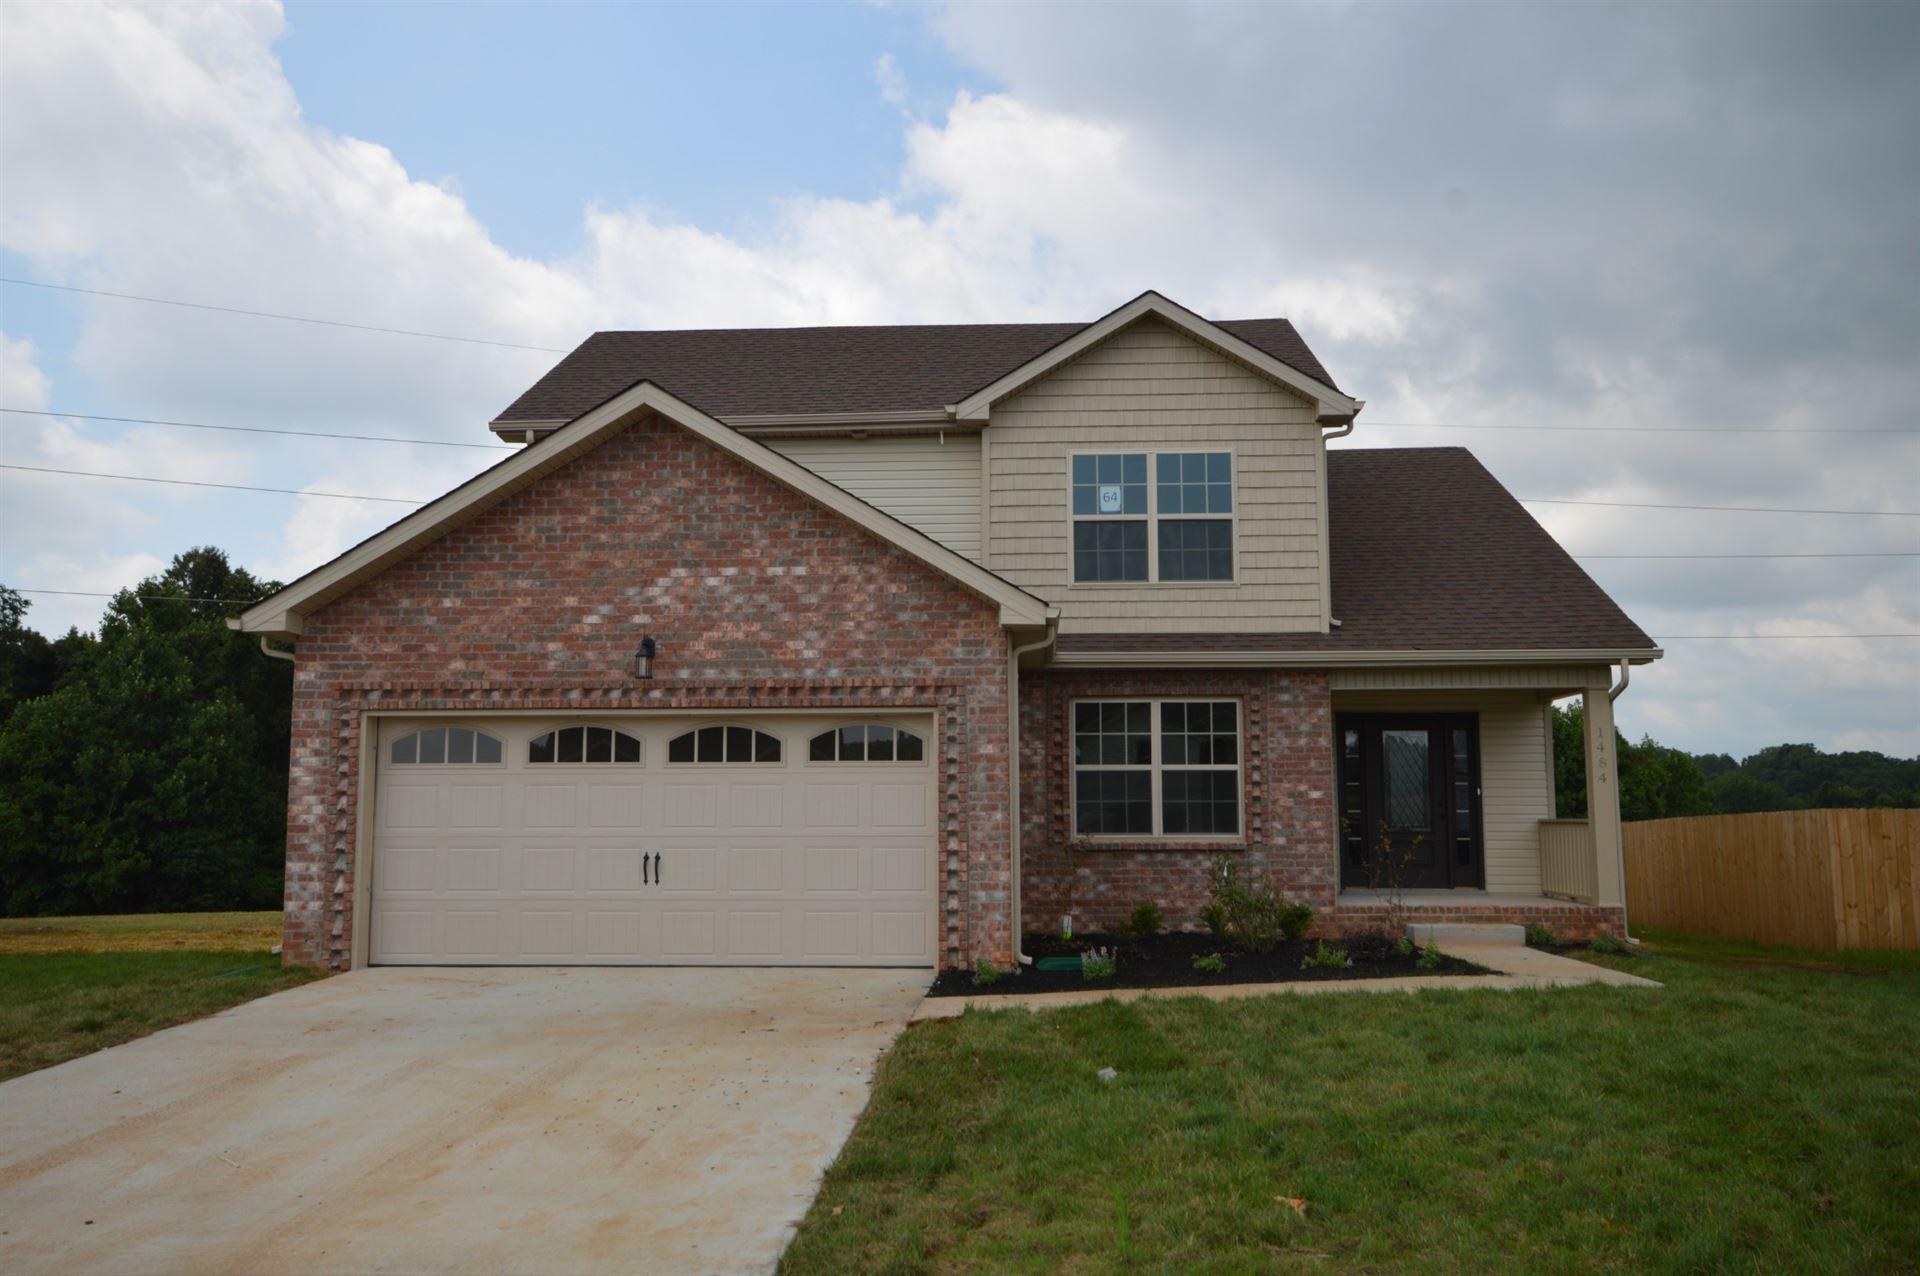 64 Woodland Springs, Clarksville, TN 37042 - MLS#: 2241748